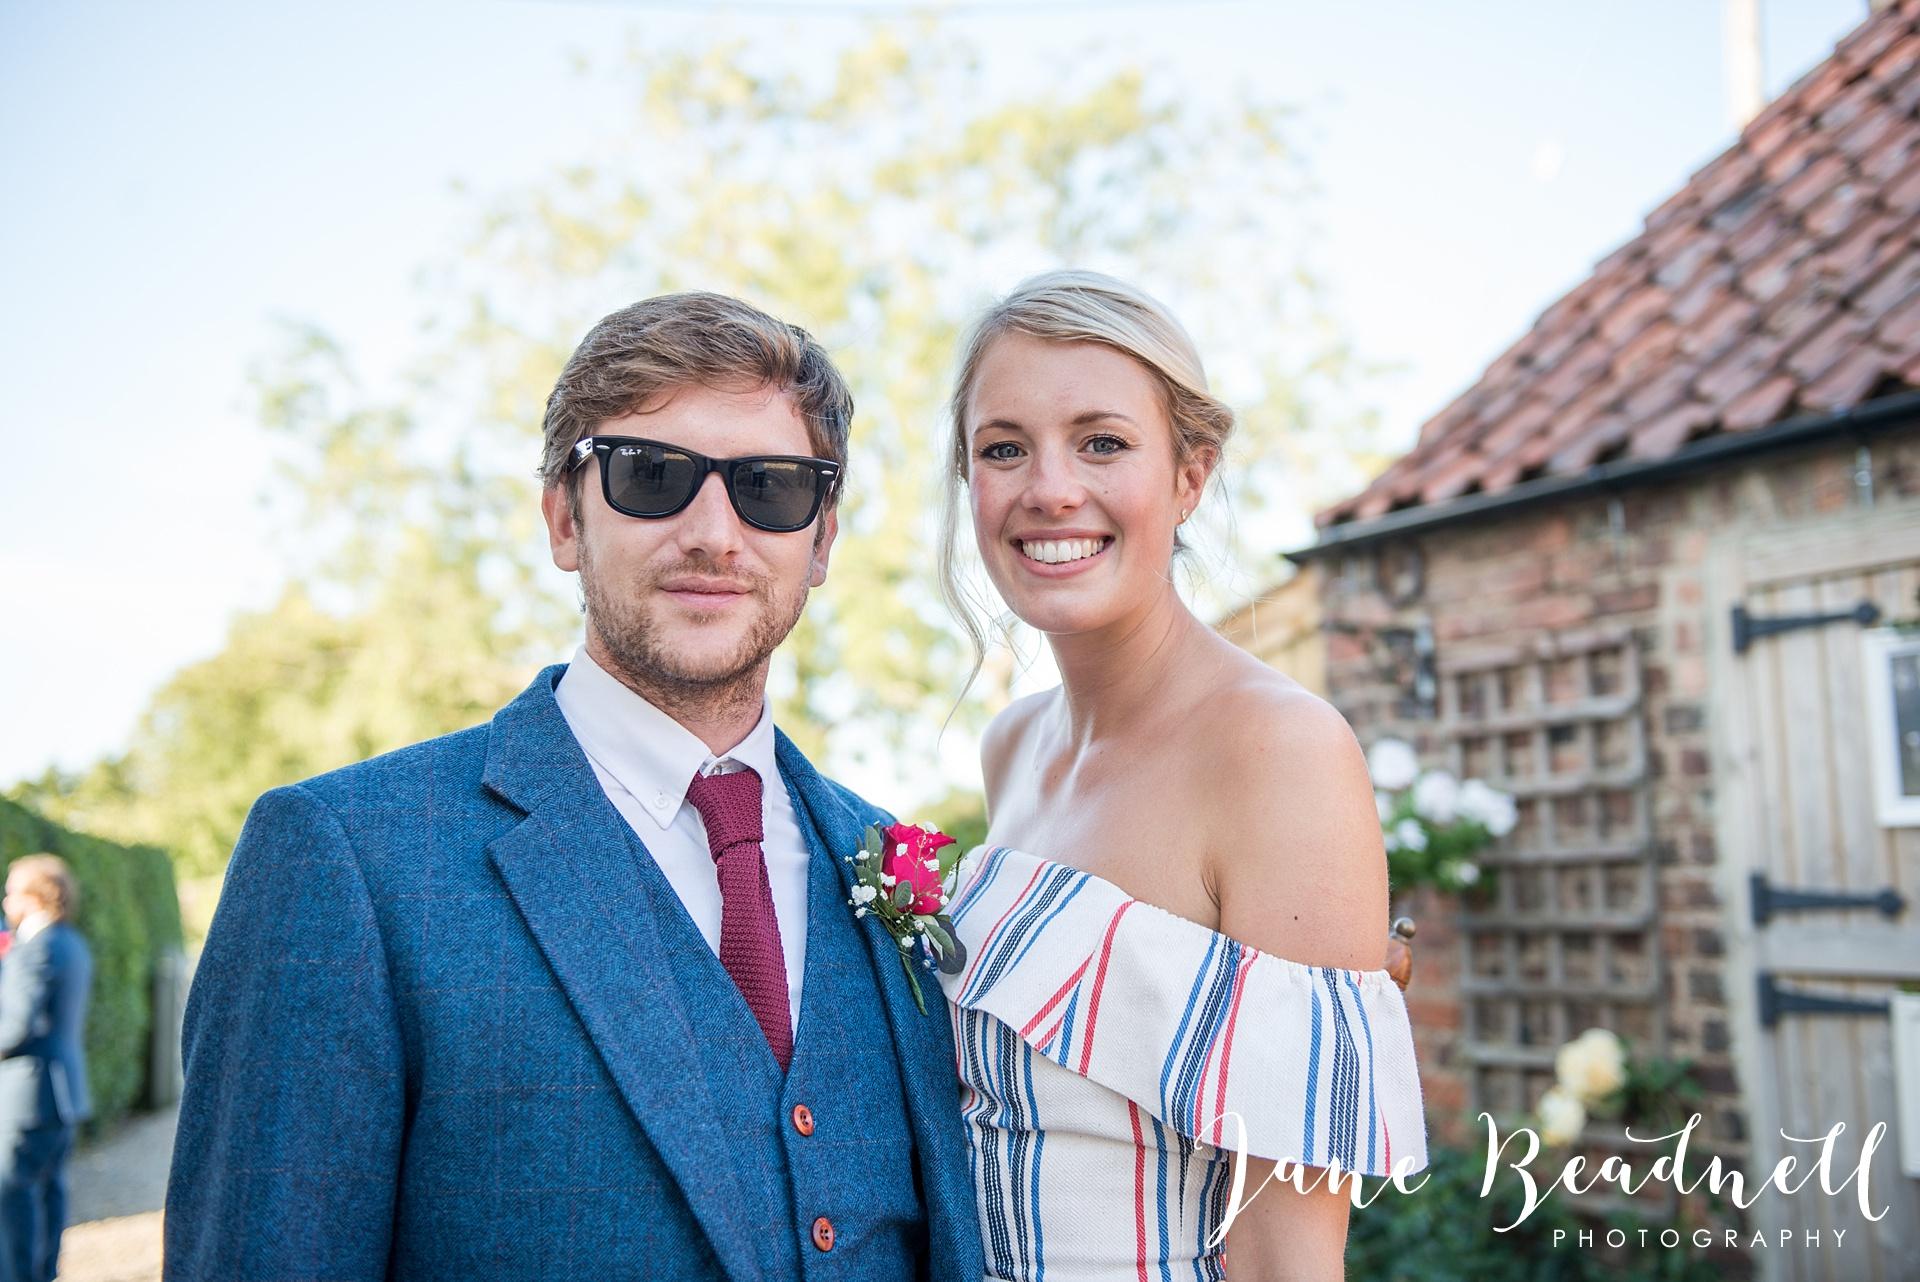 fine-art-wedding-photographer-jane-beadnell-yorkshire-wedding-photographer_0095